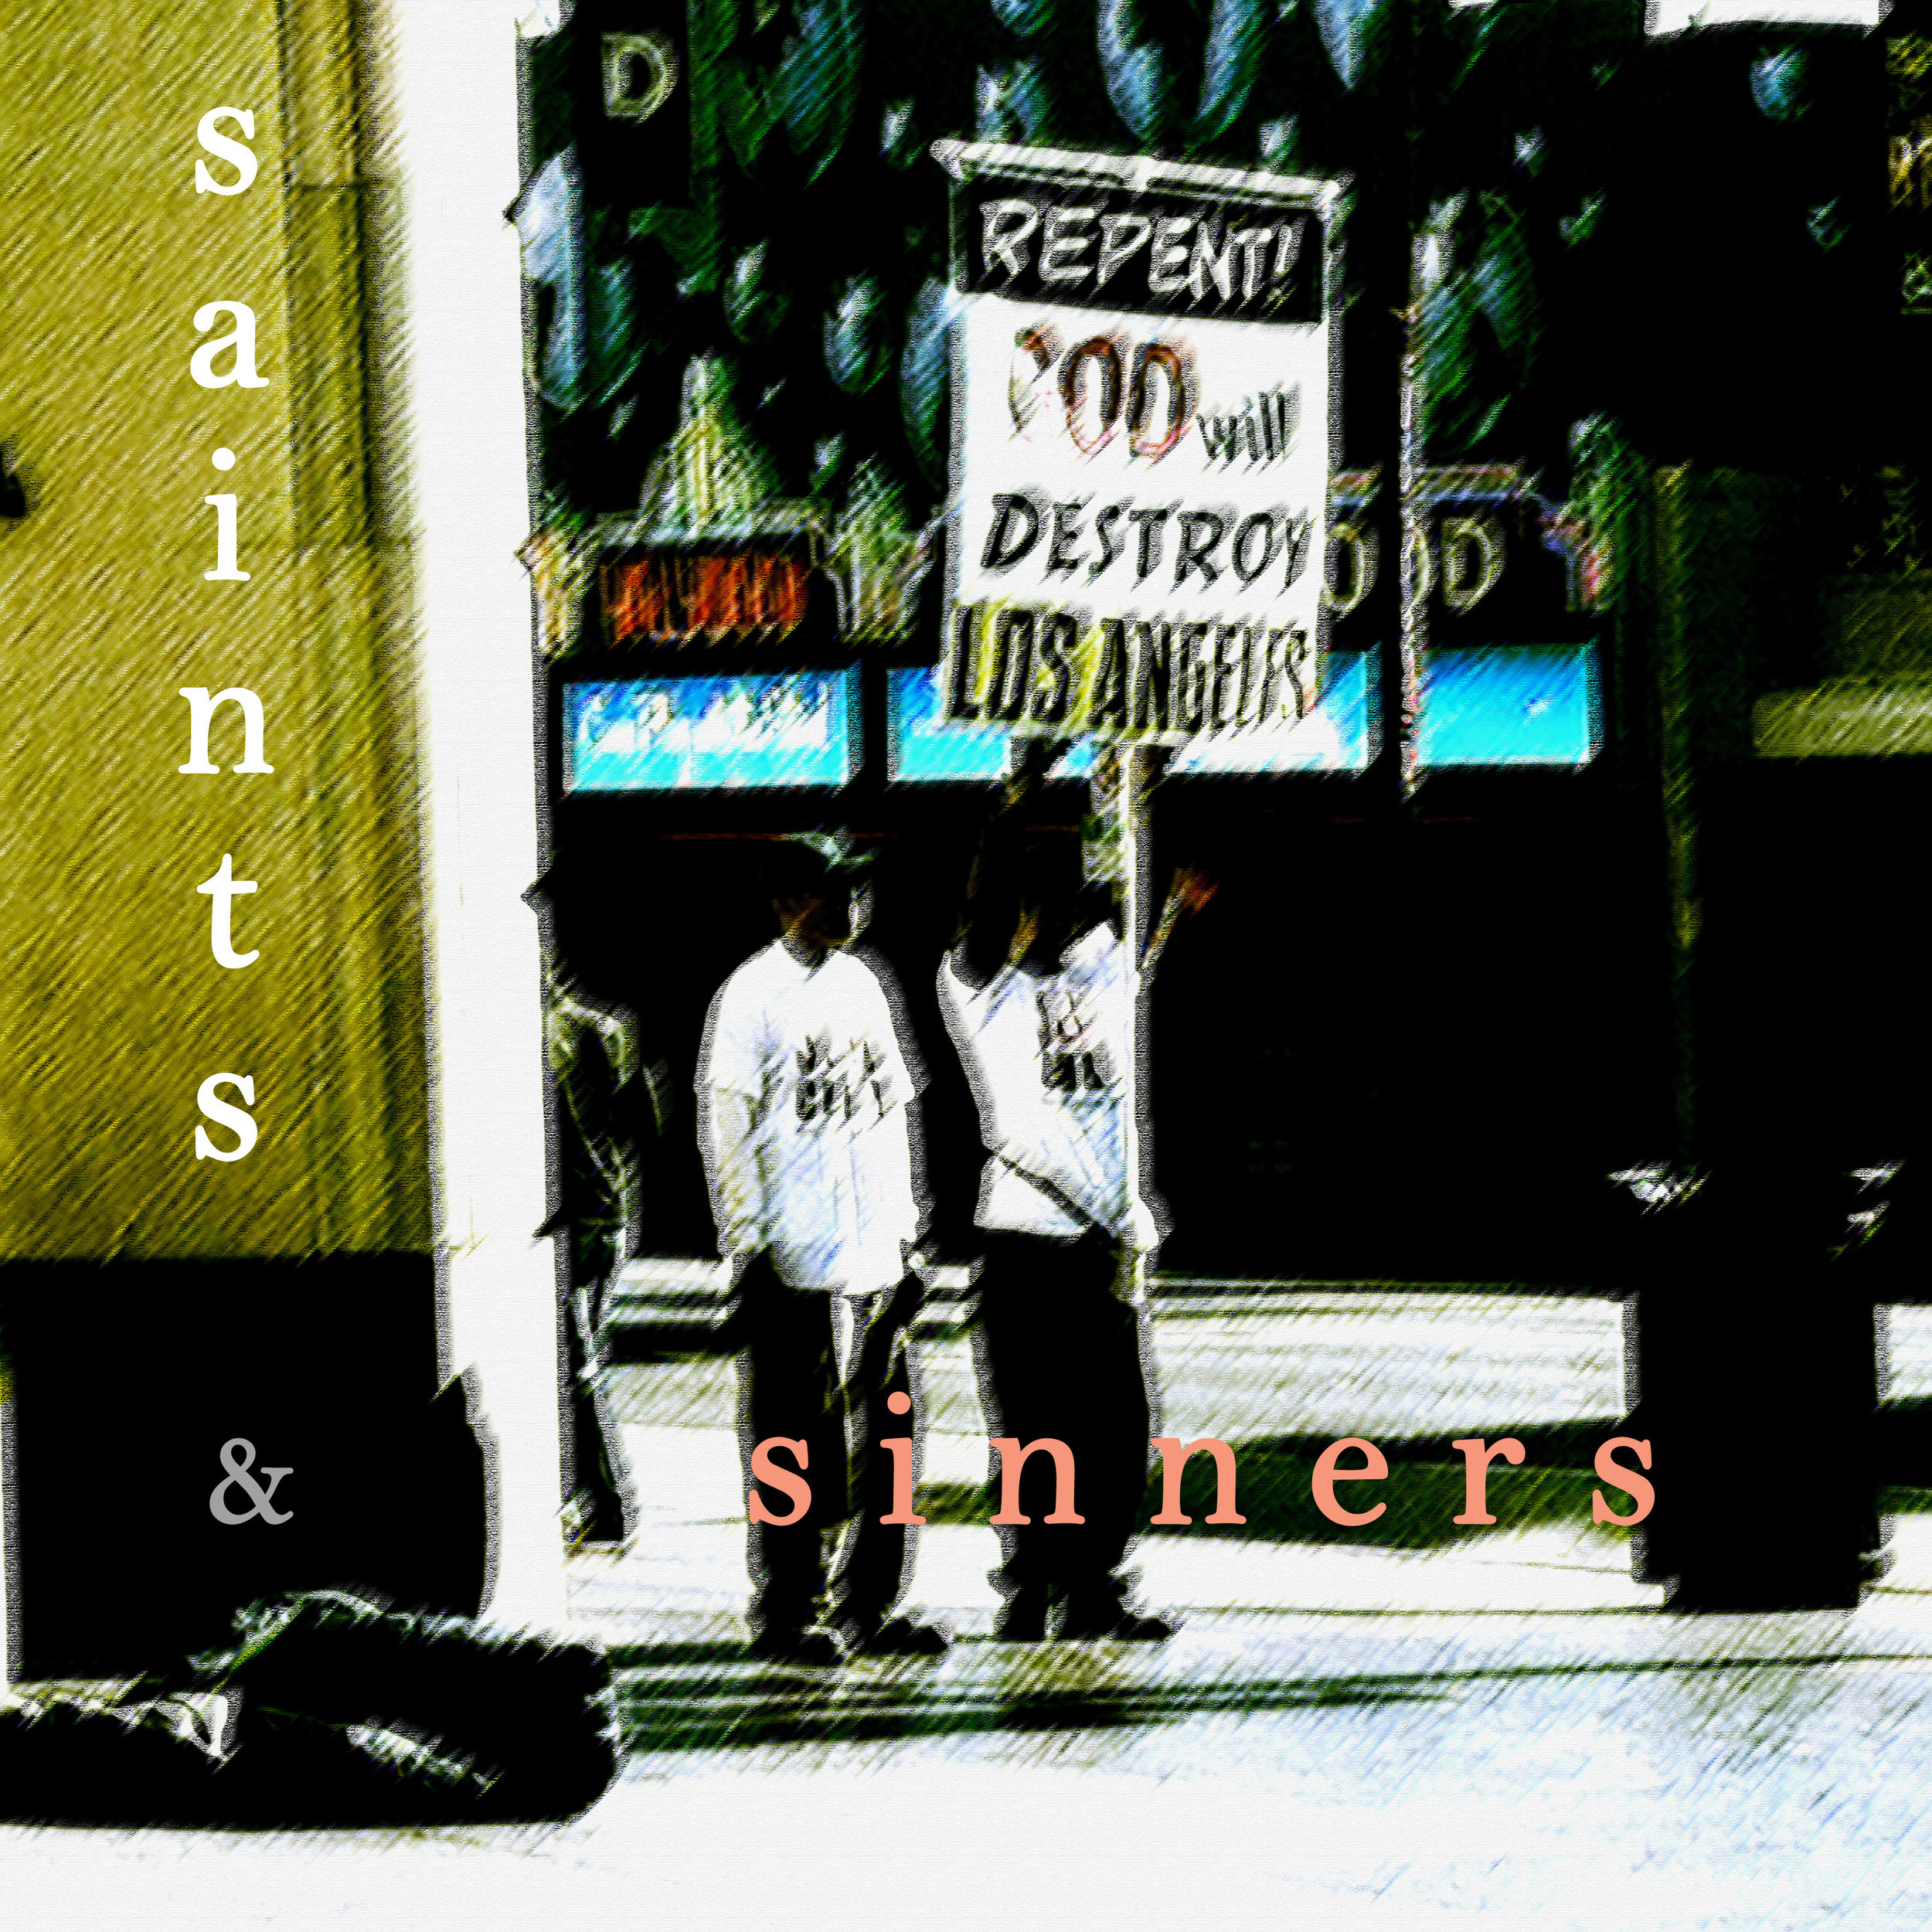 Saints&Sinners07.jpg